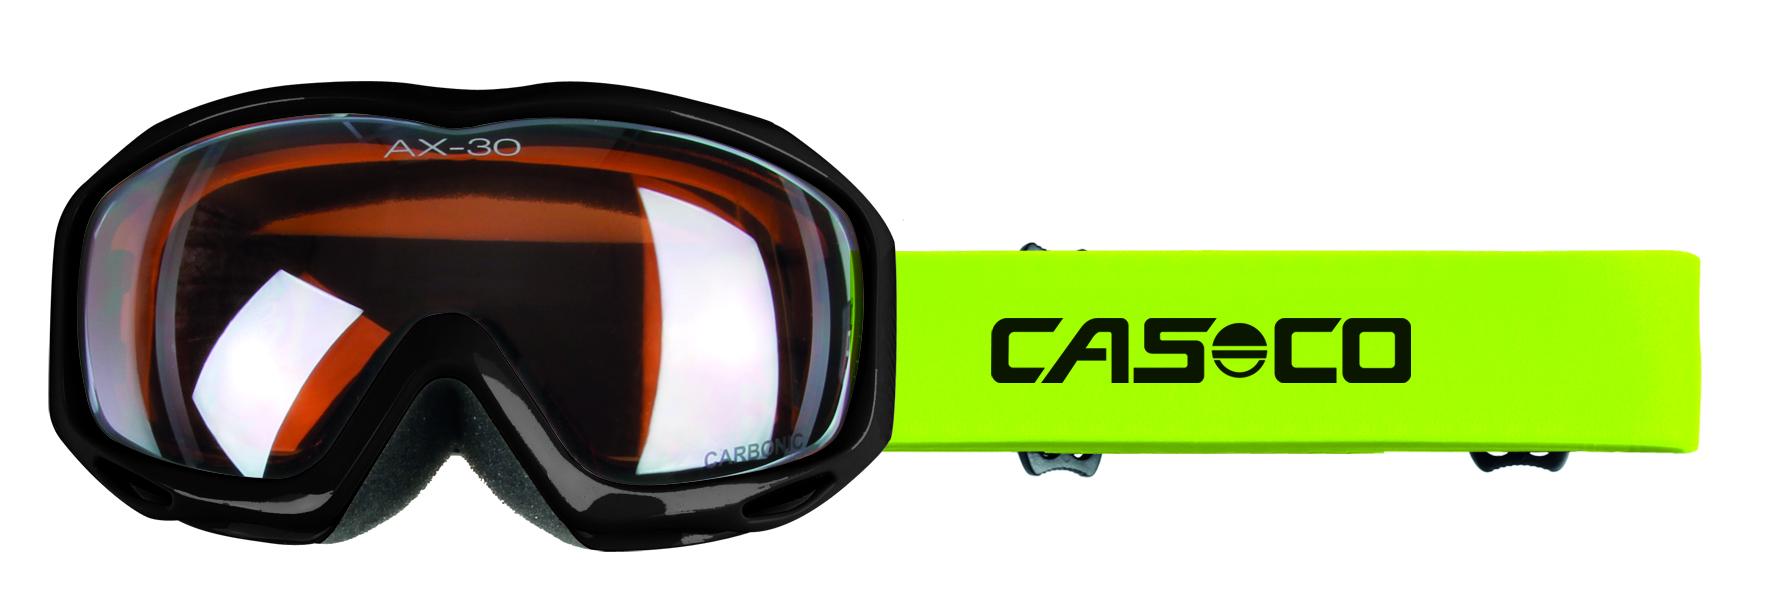 CASCO AX30